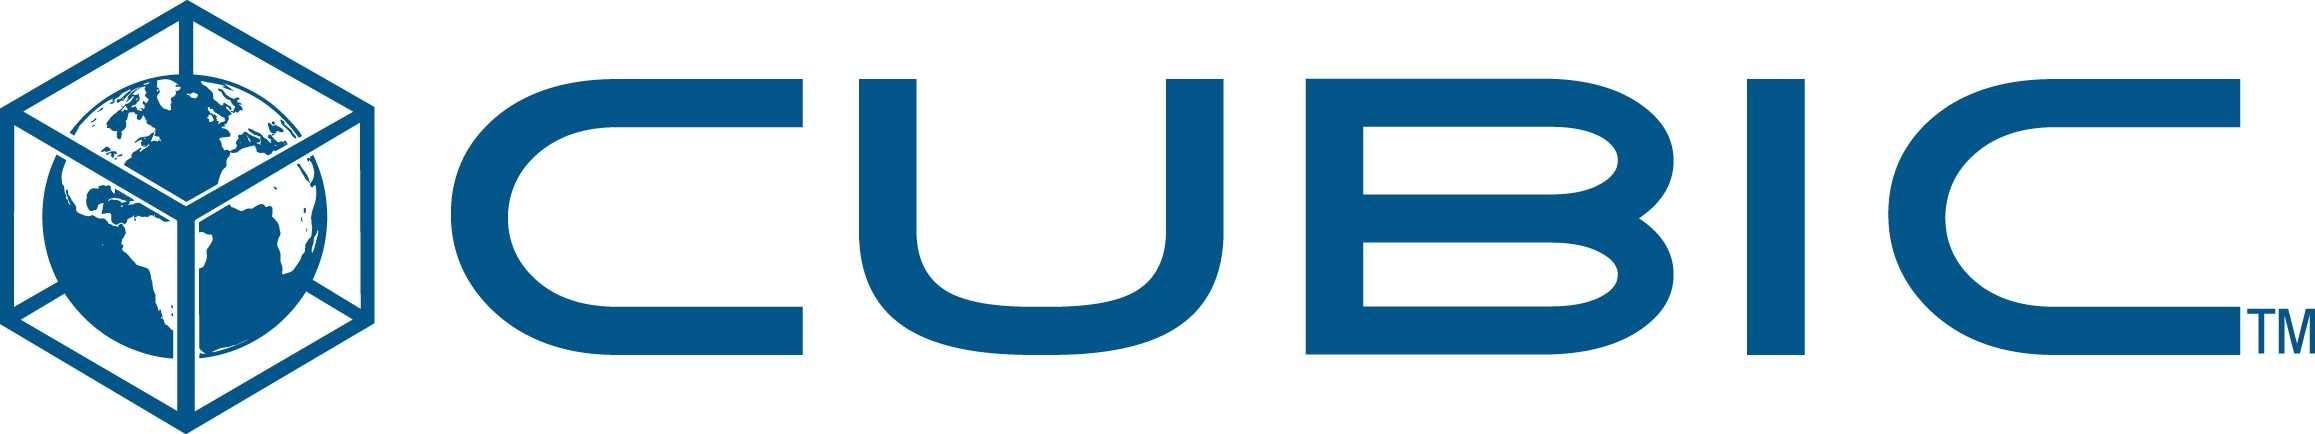 Cubic logo_MoD 2020